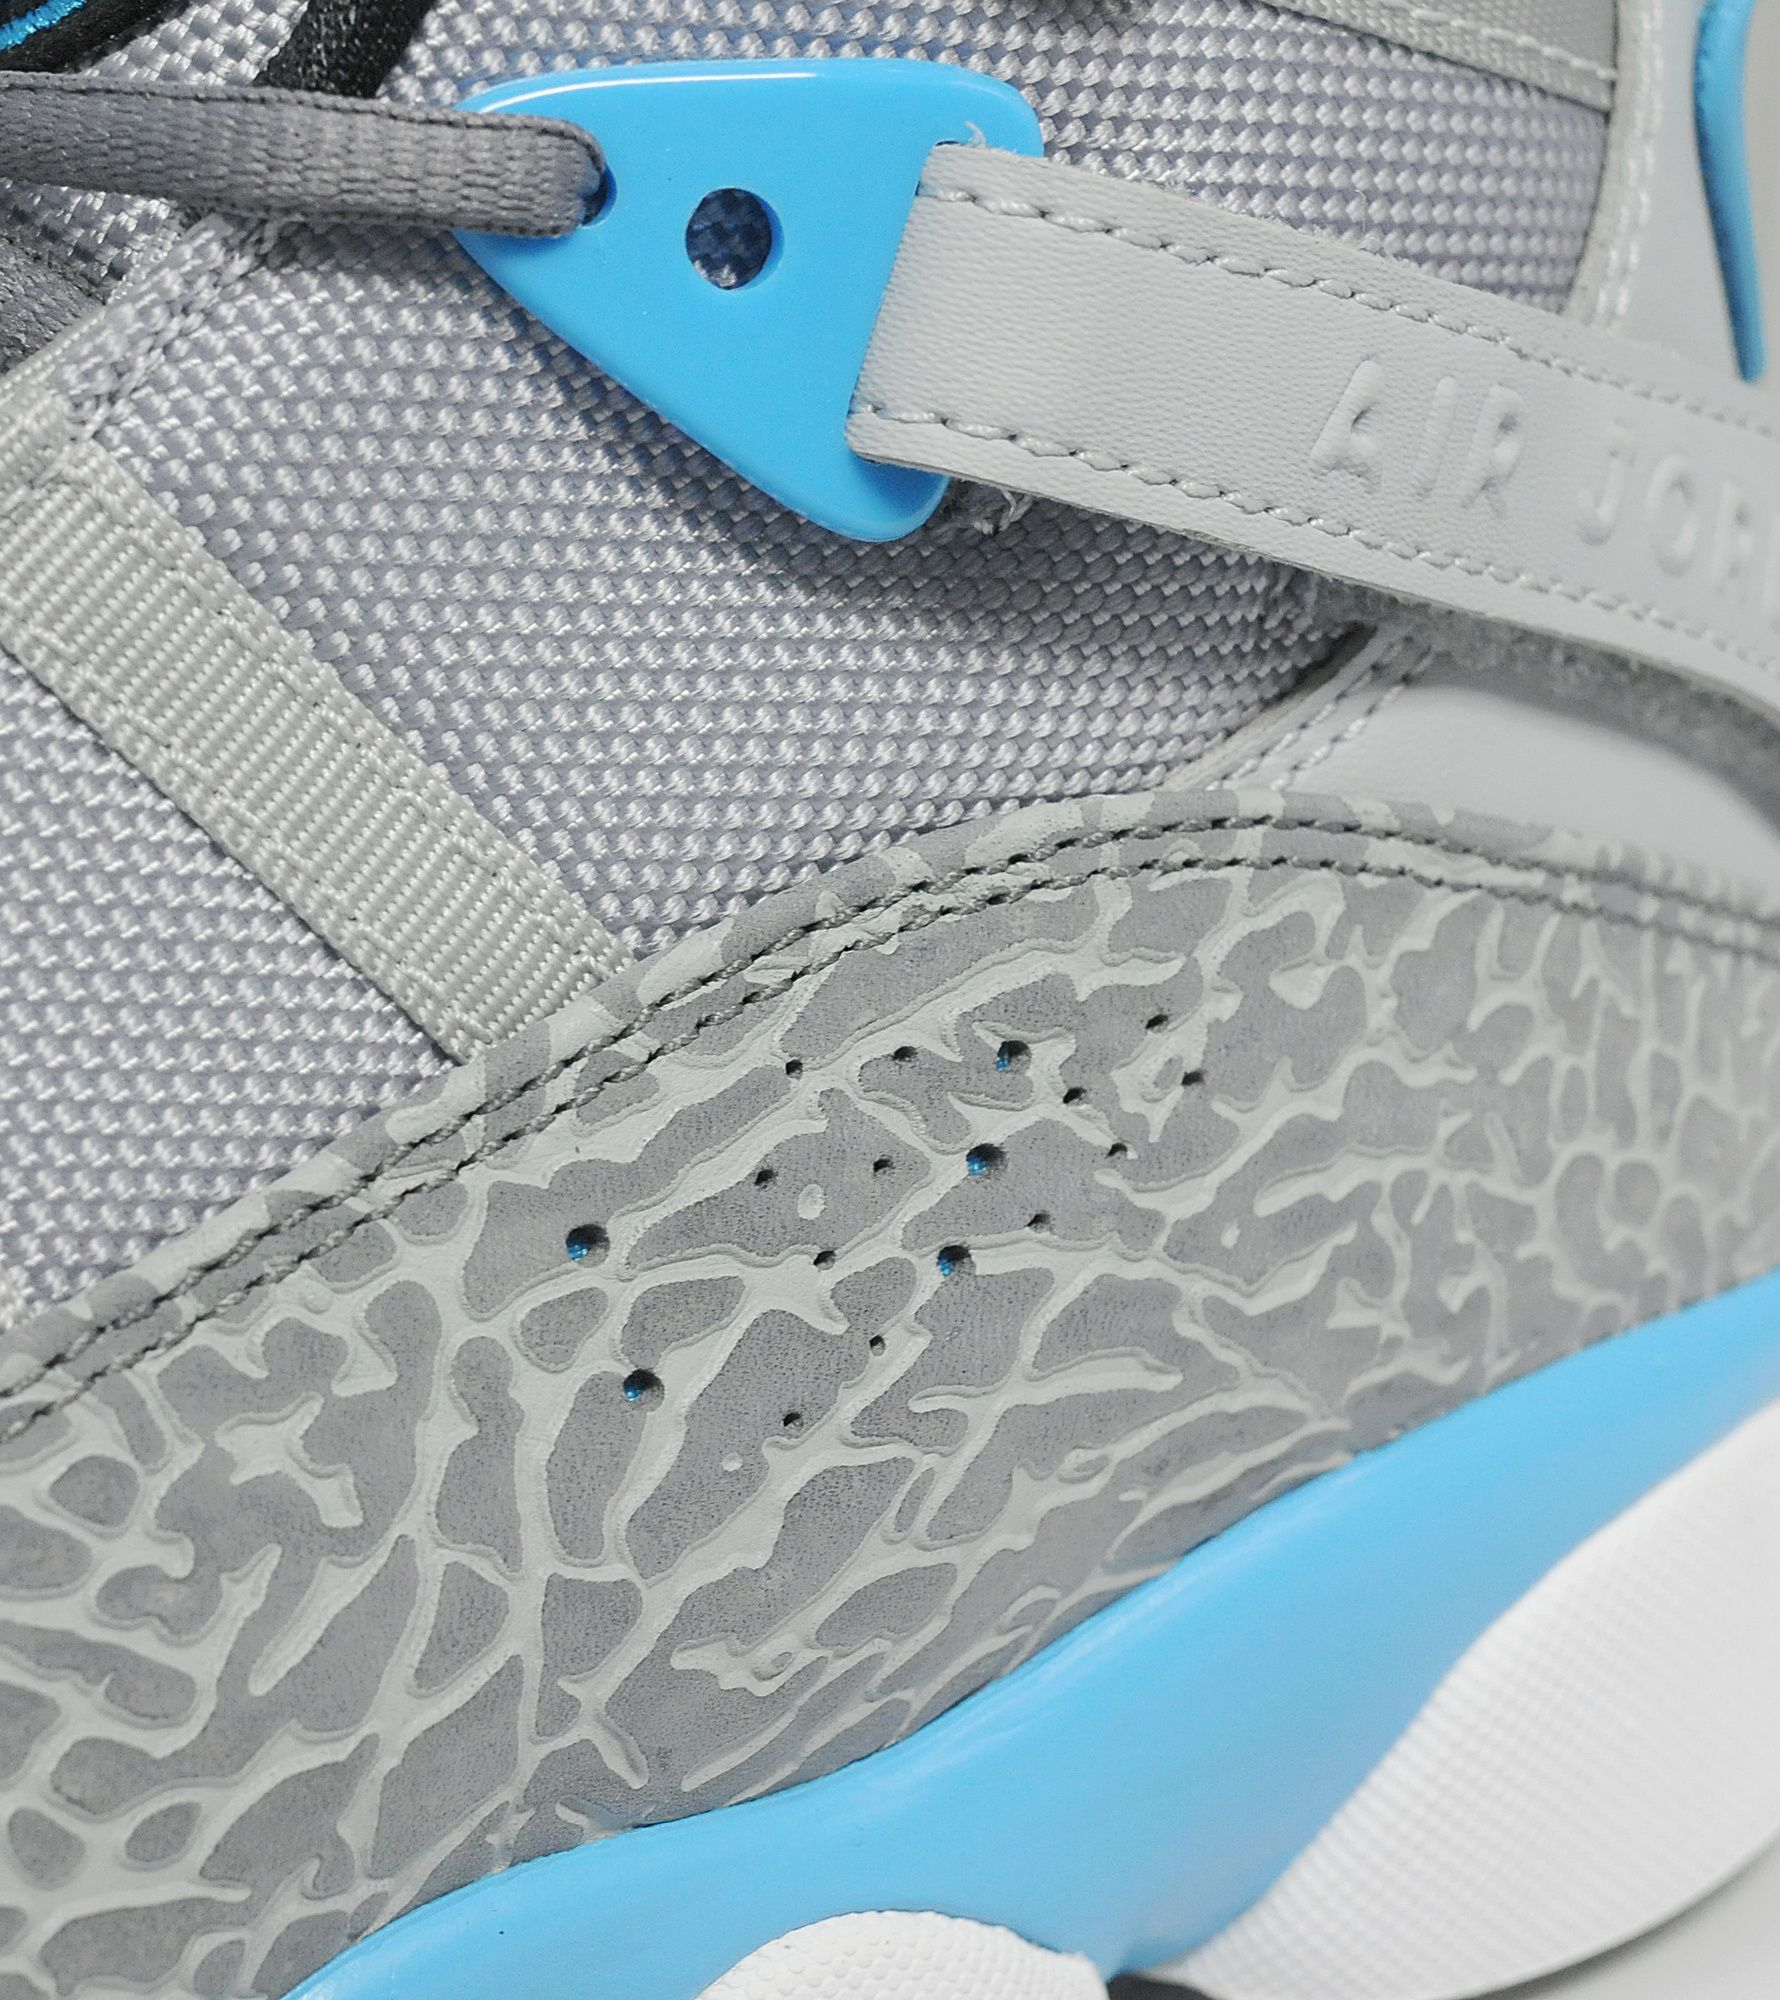 Jordans 6 rings powder blue